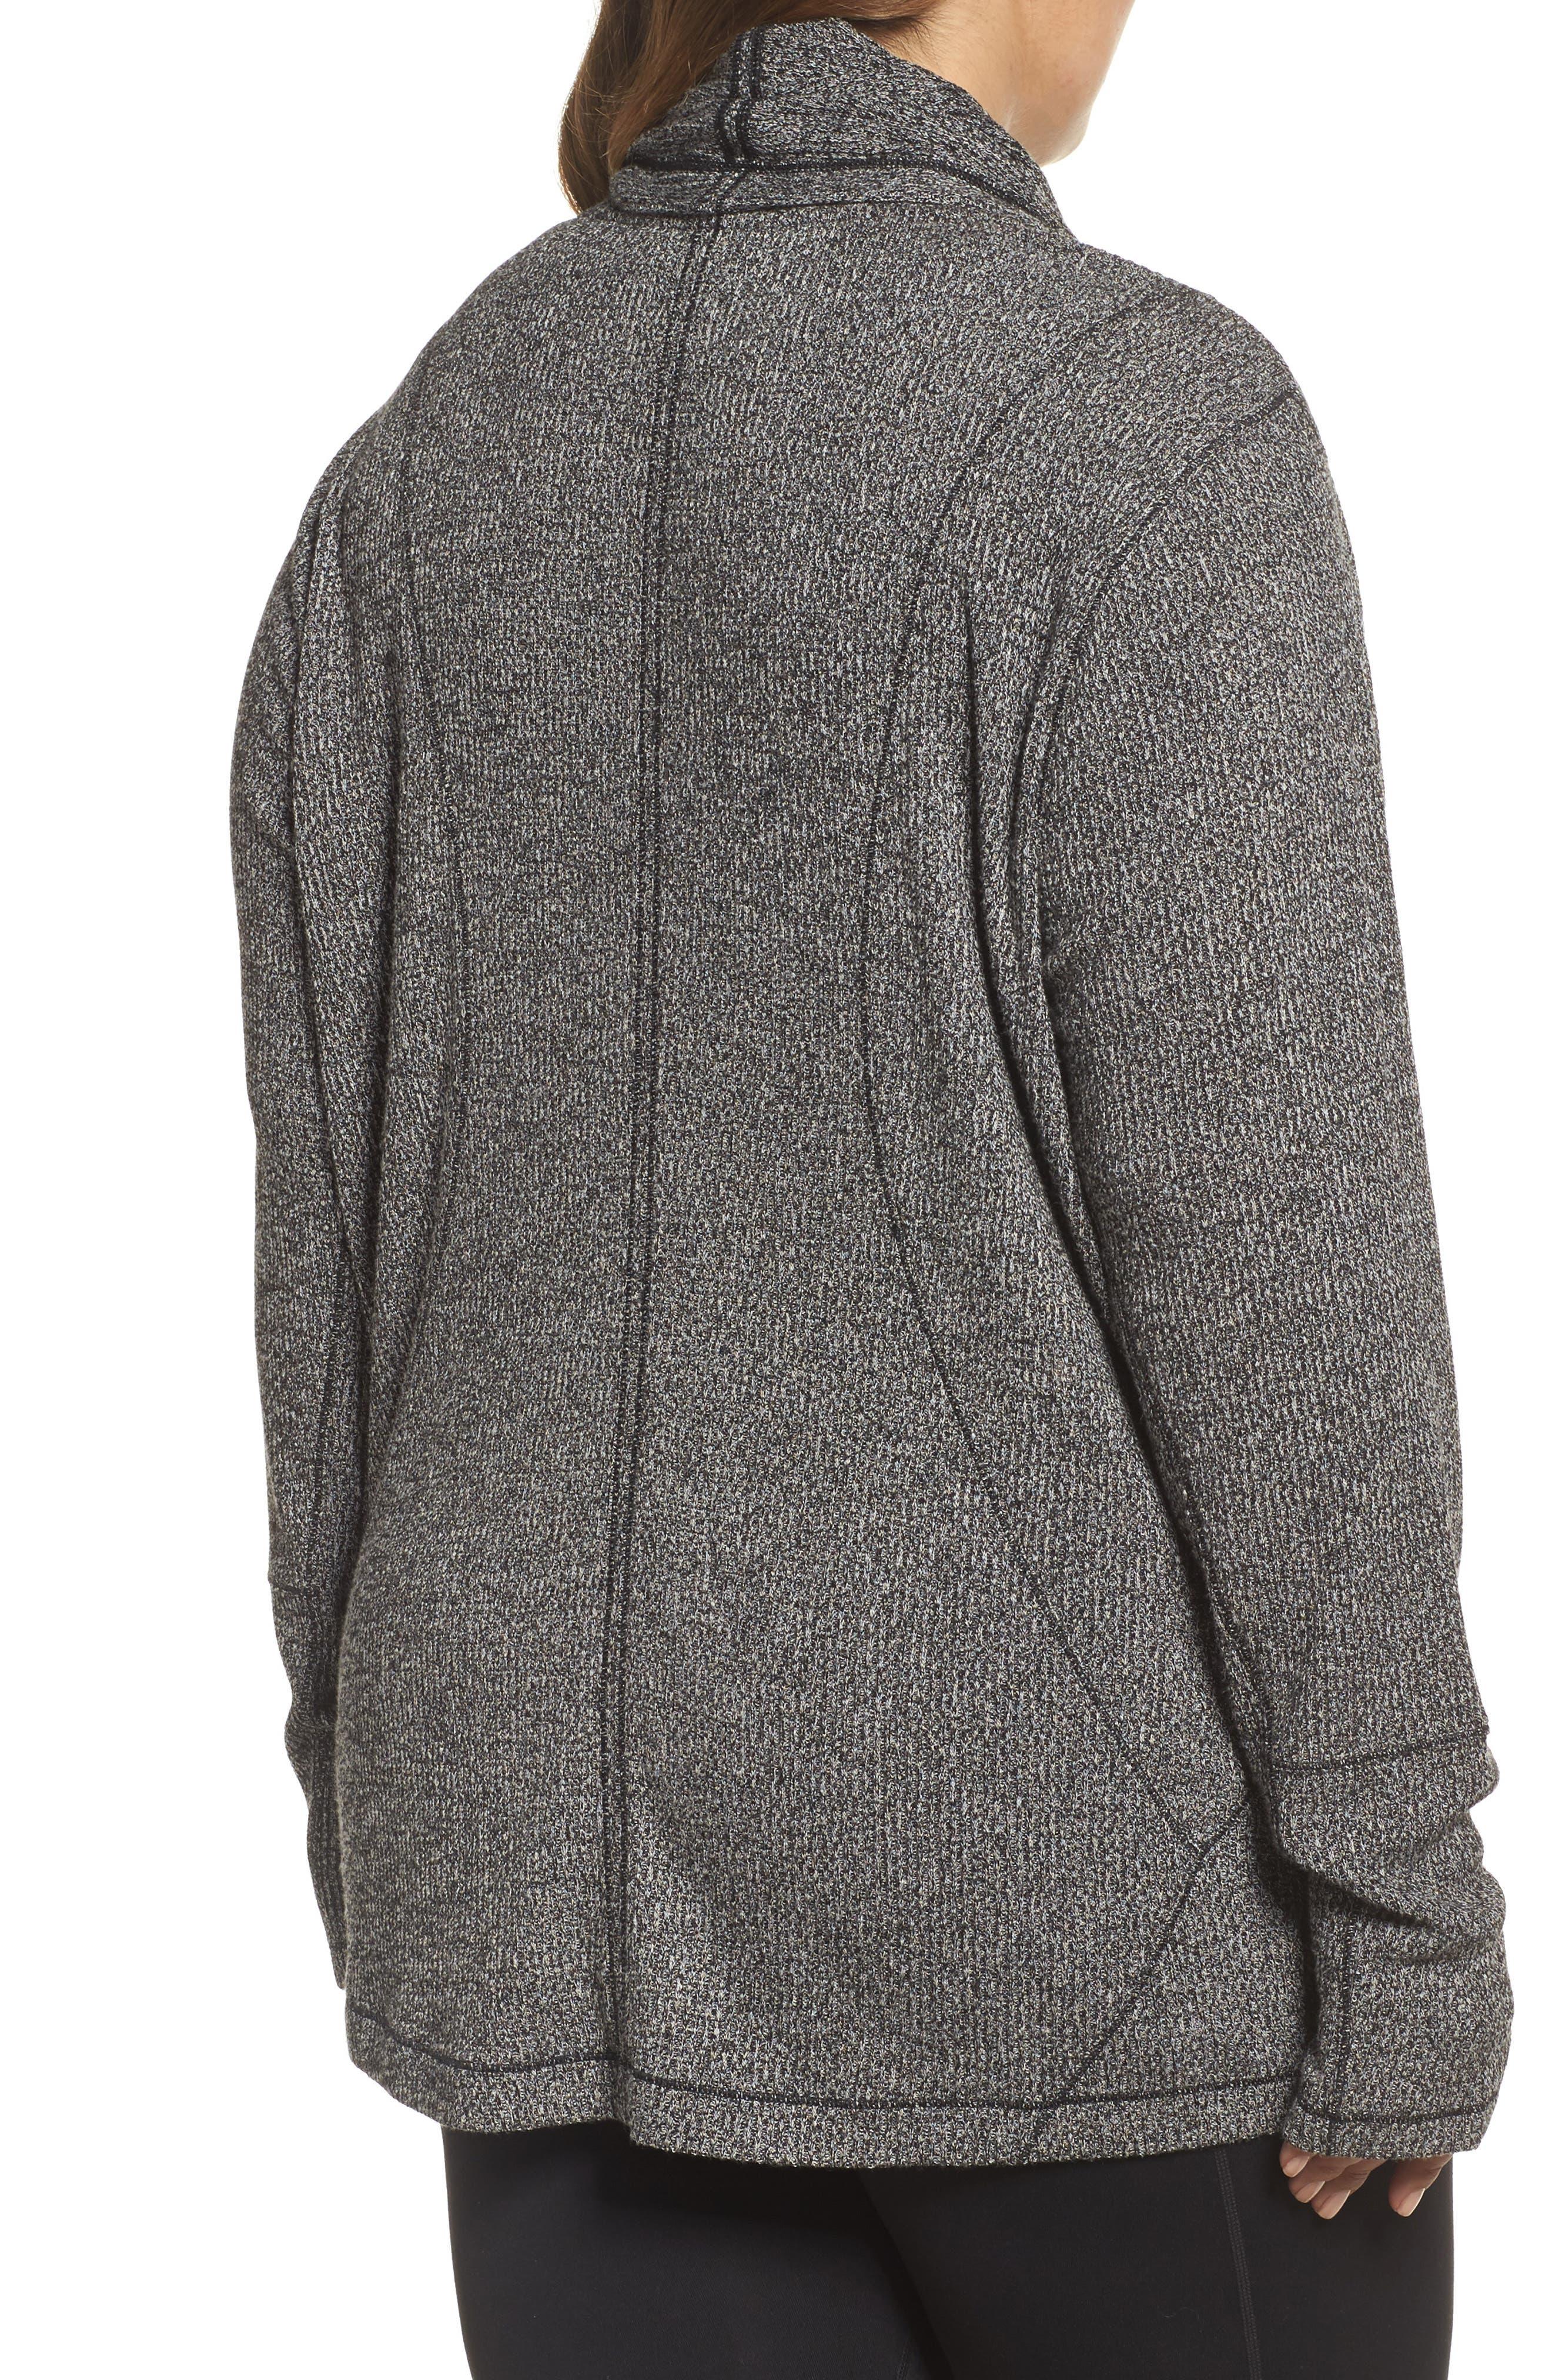 Alternate Image 2  - Zella Enlighten Me Ribbed Cardigan (Plus Size)